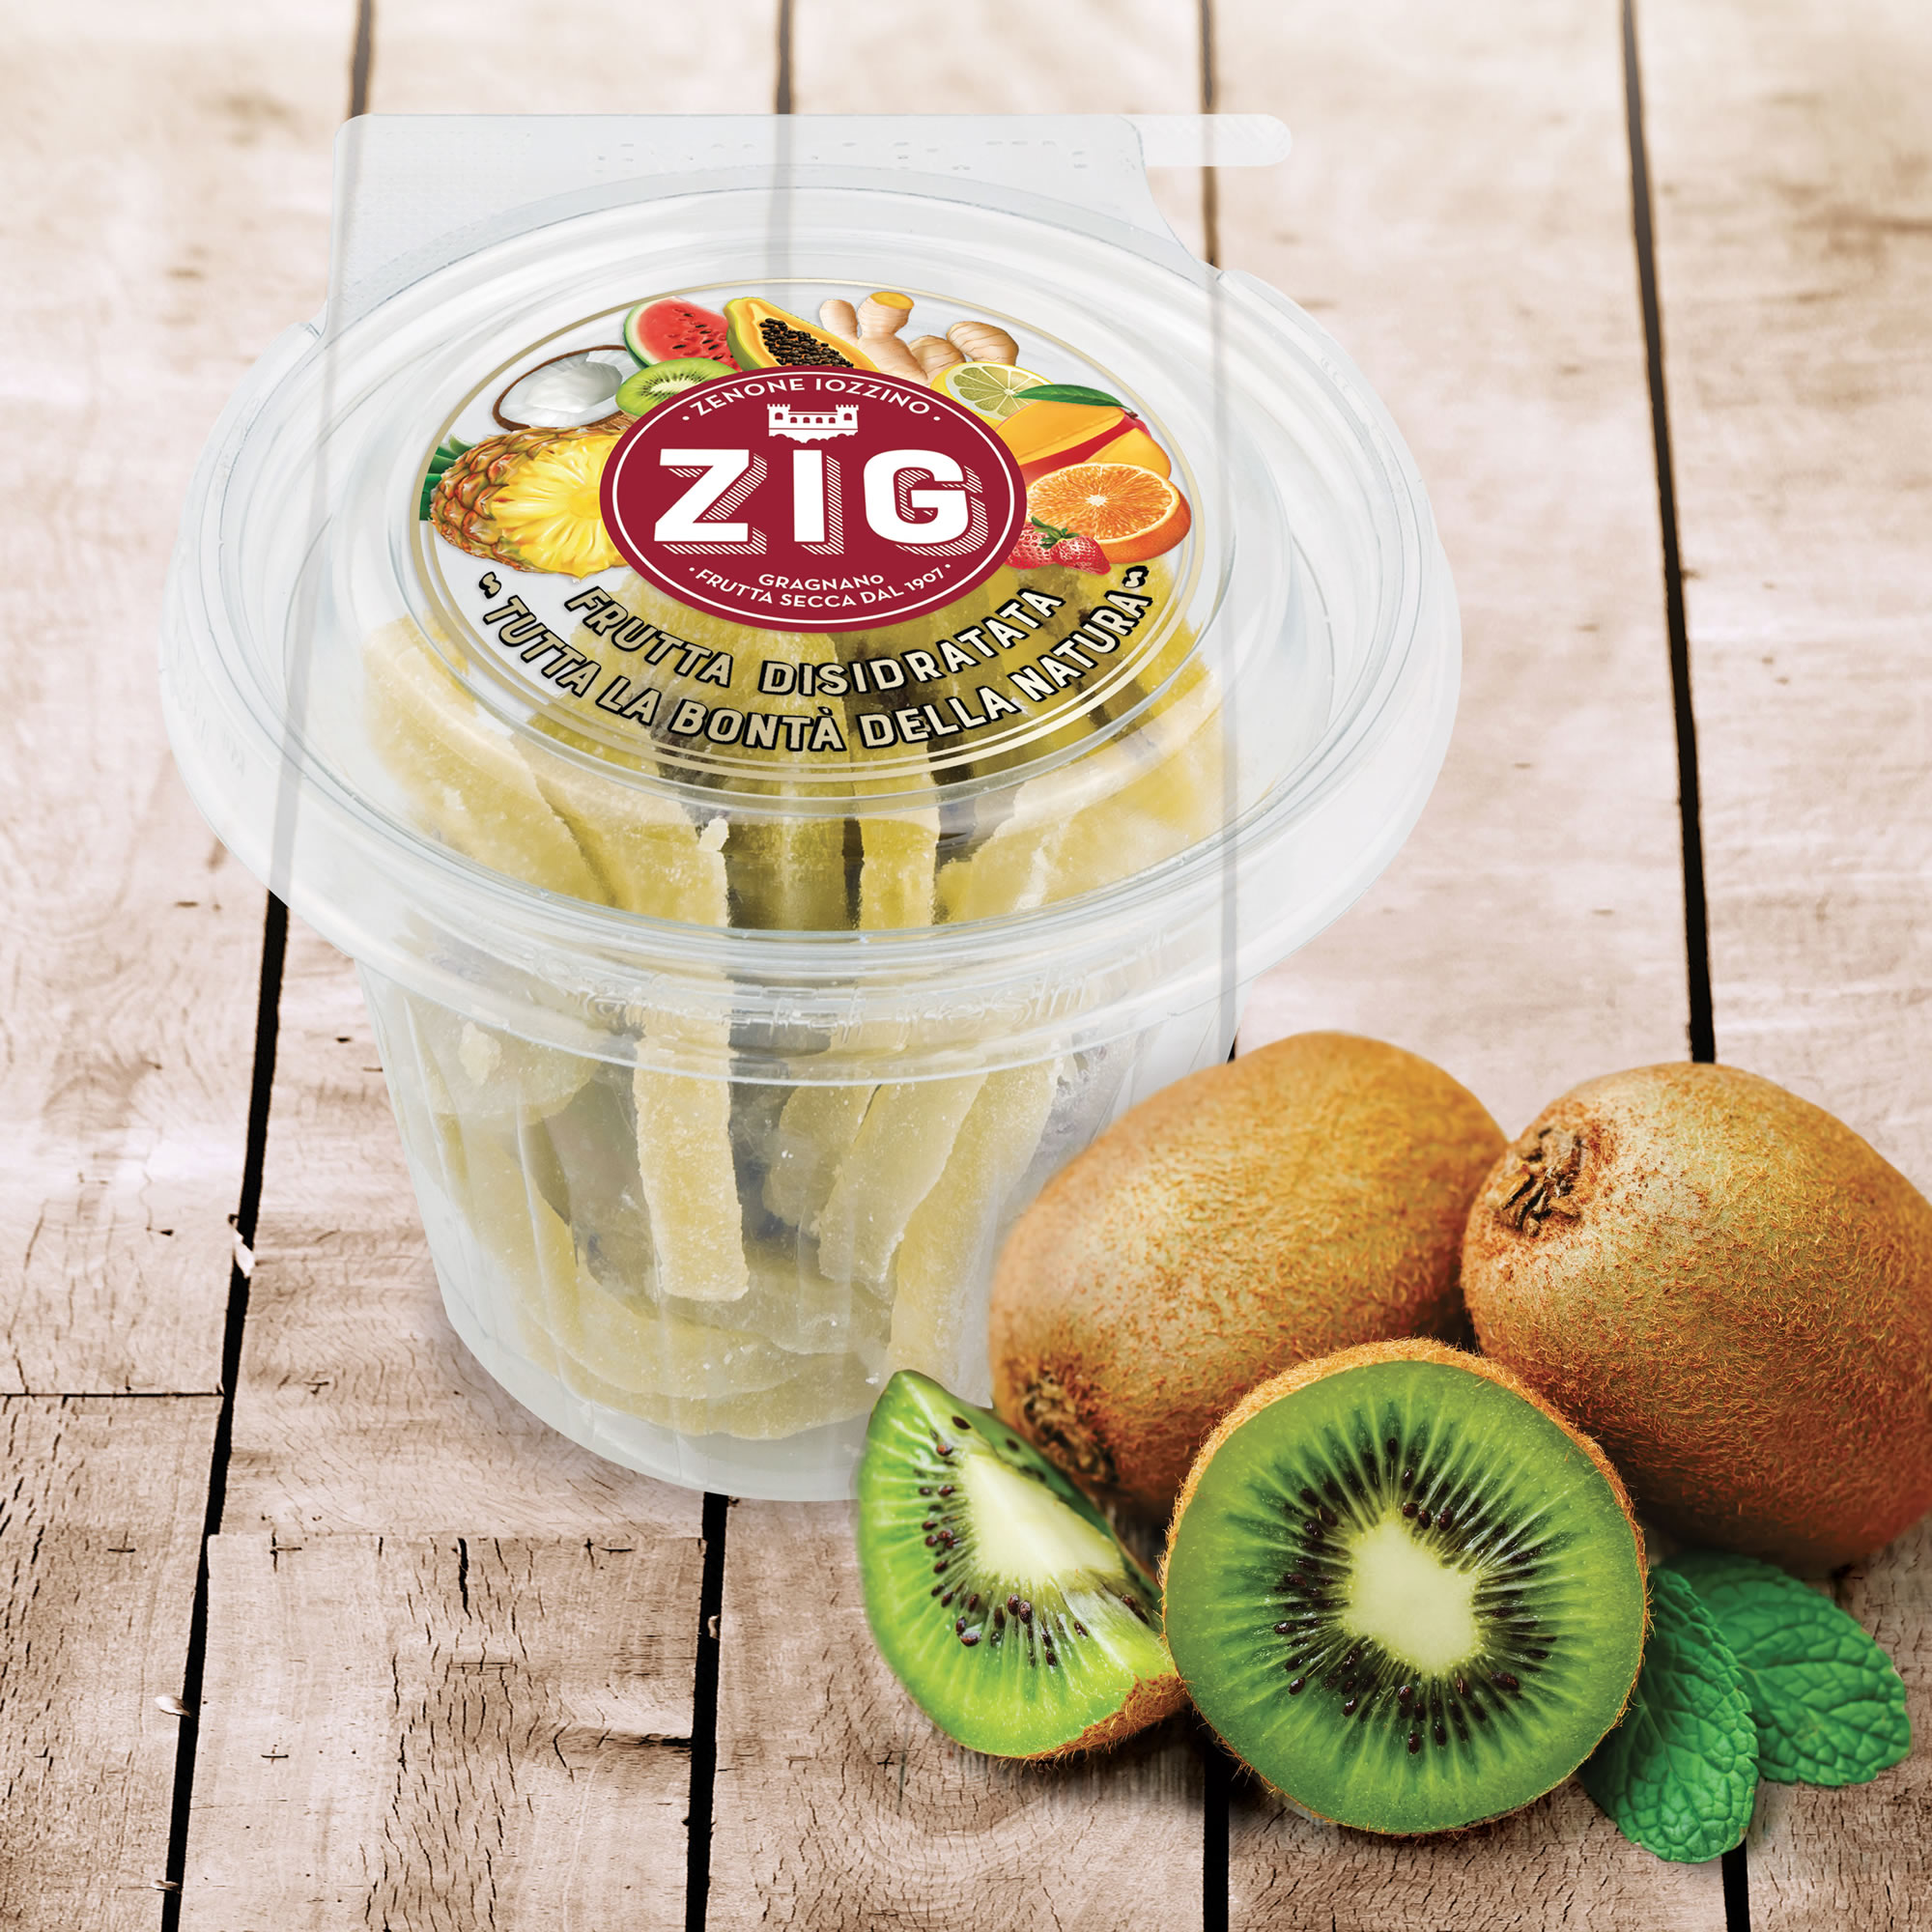 zig-frutta-disidratata-home